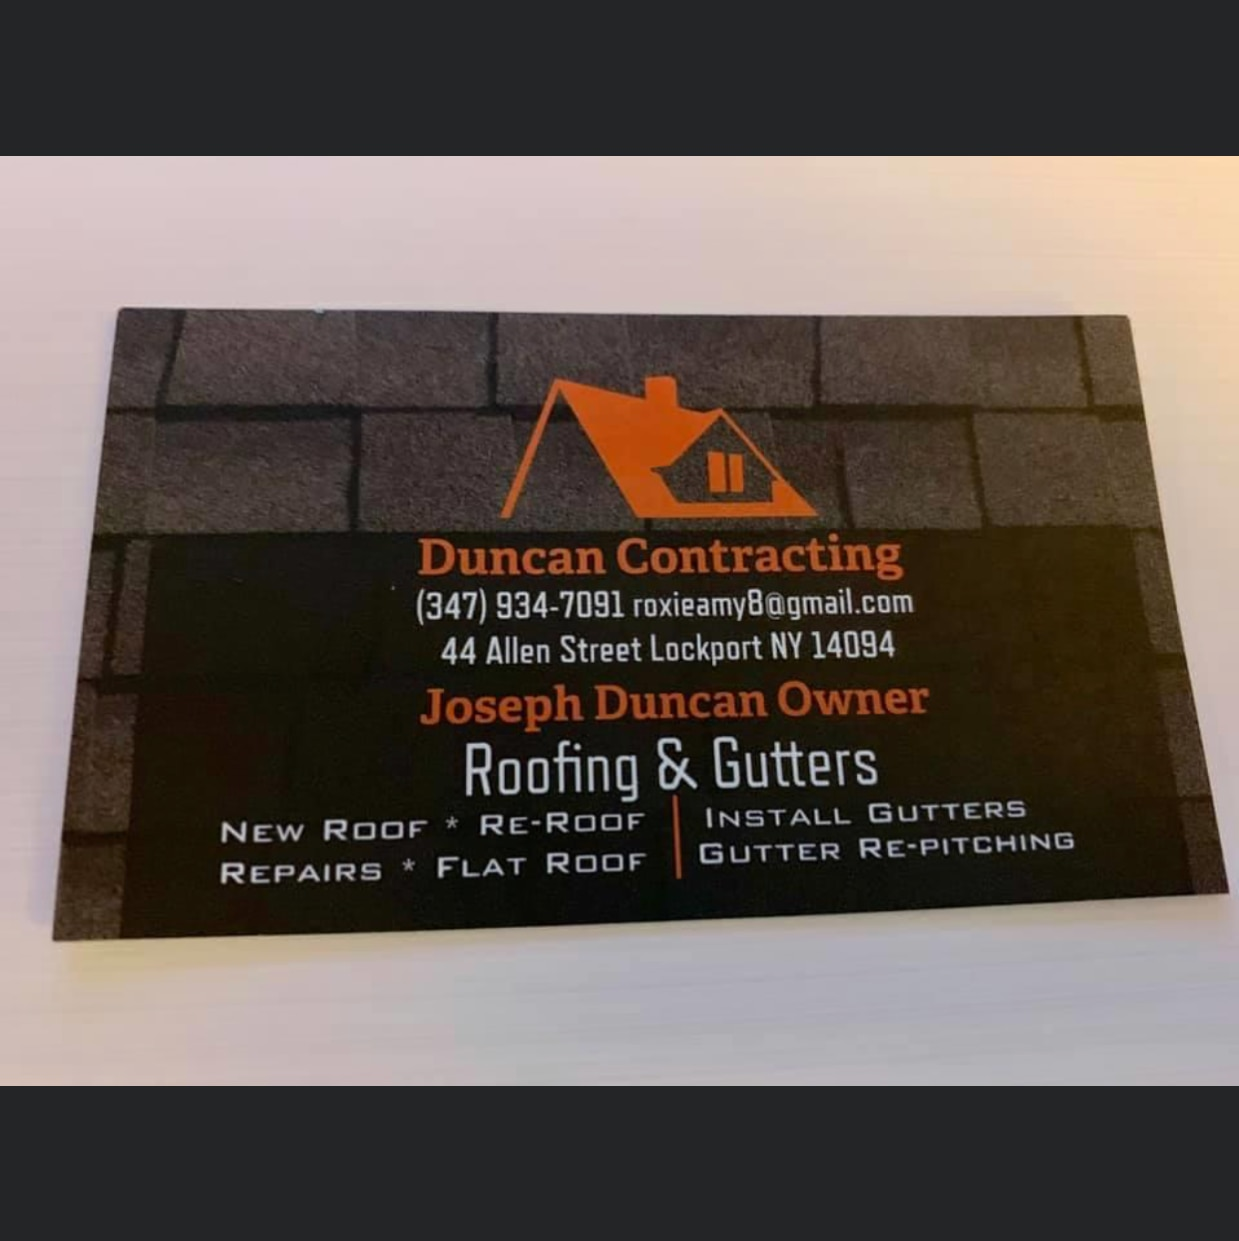 Duncan Contracting logo